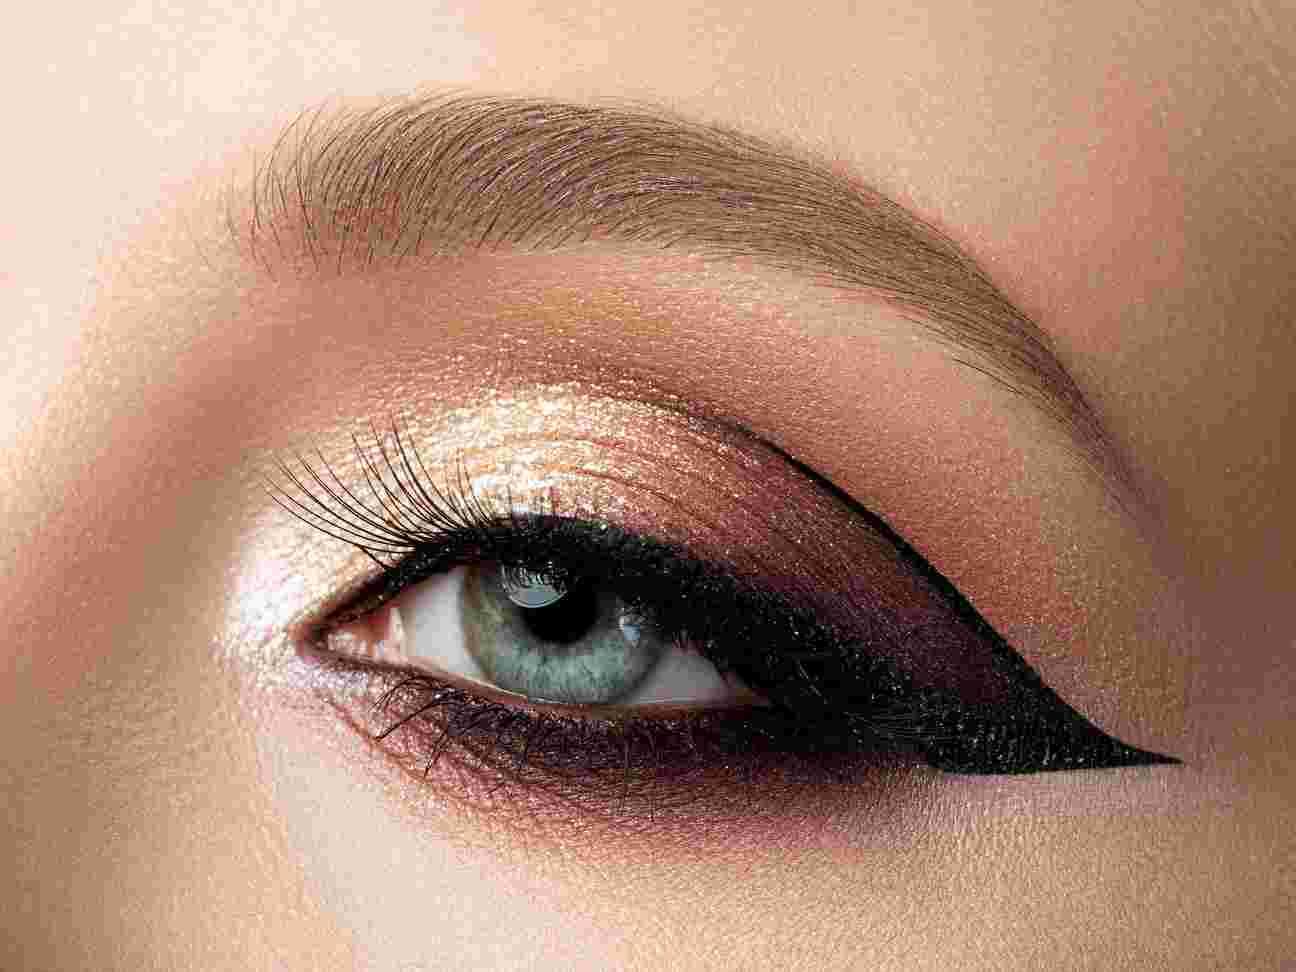 trucco occhi 2020 Cut Crease makeup, cosa è